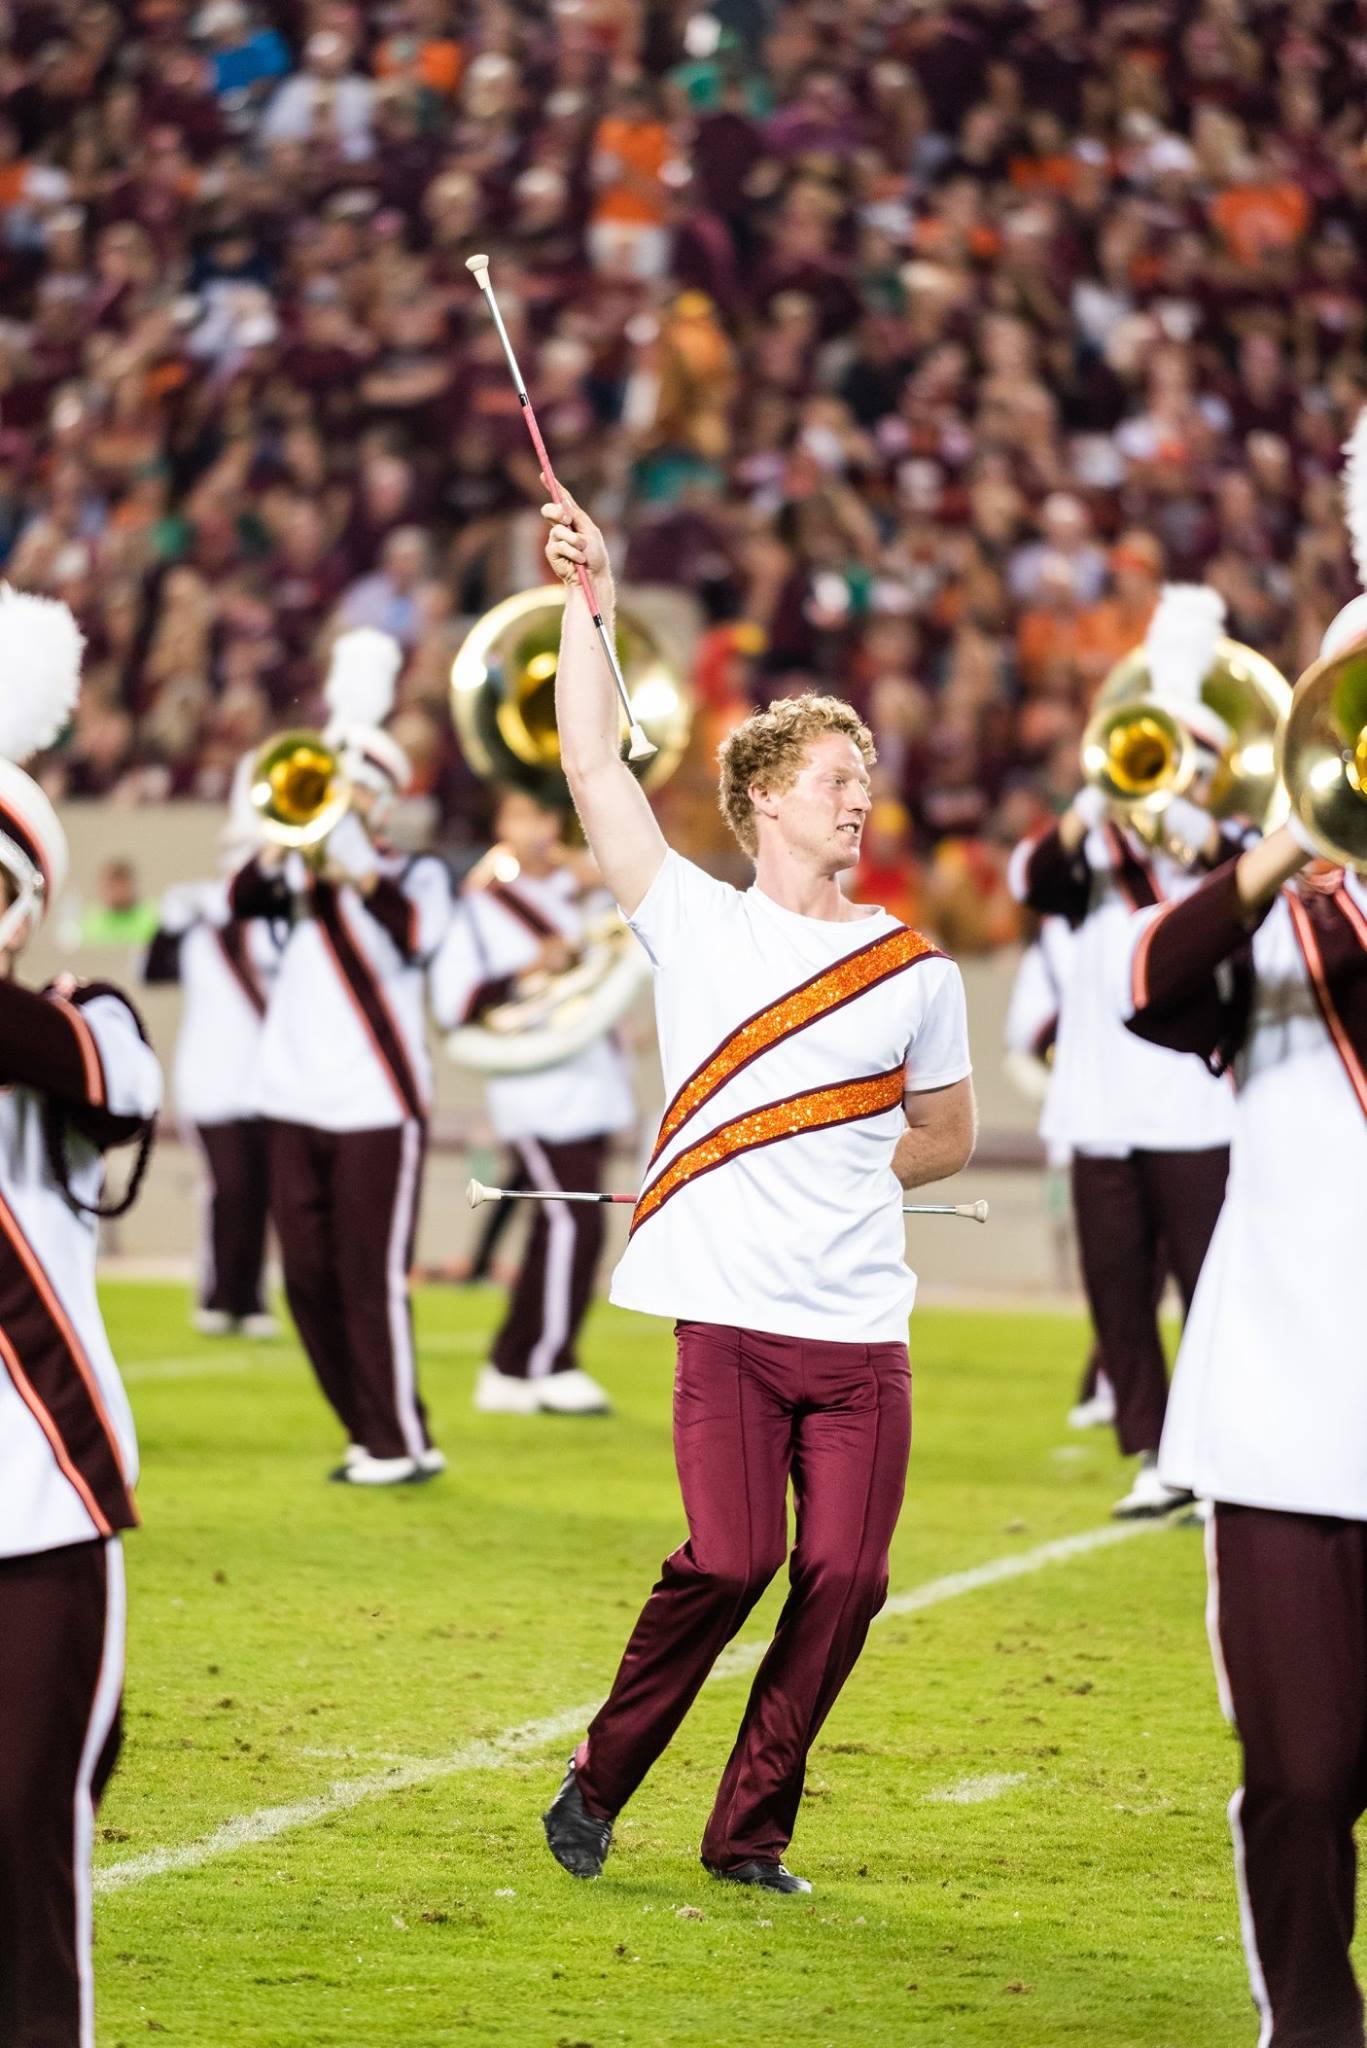 Connor performing on-field in Lane Stadium; Source: Brendan Little